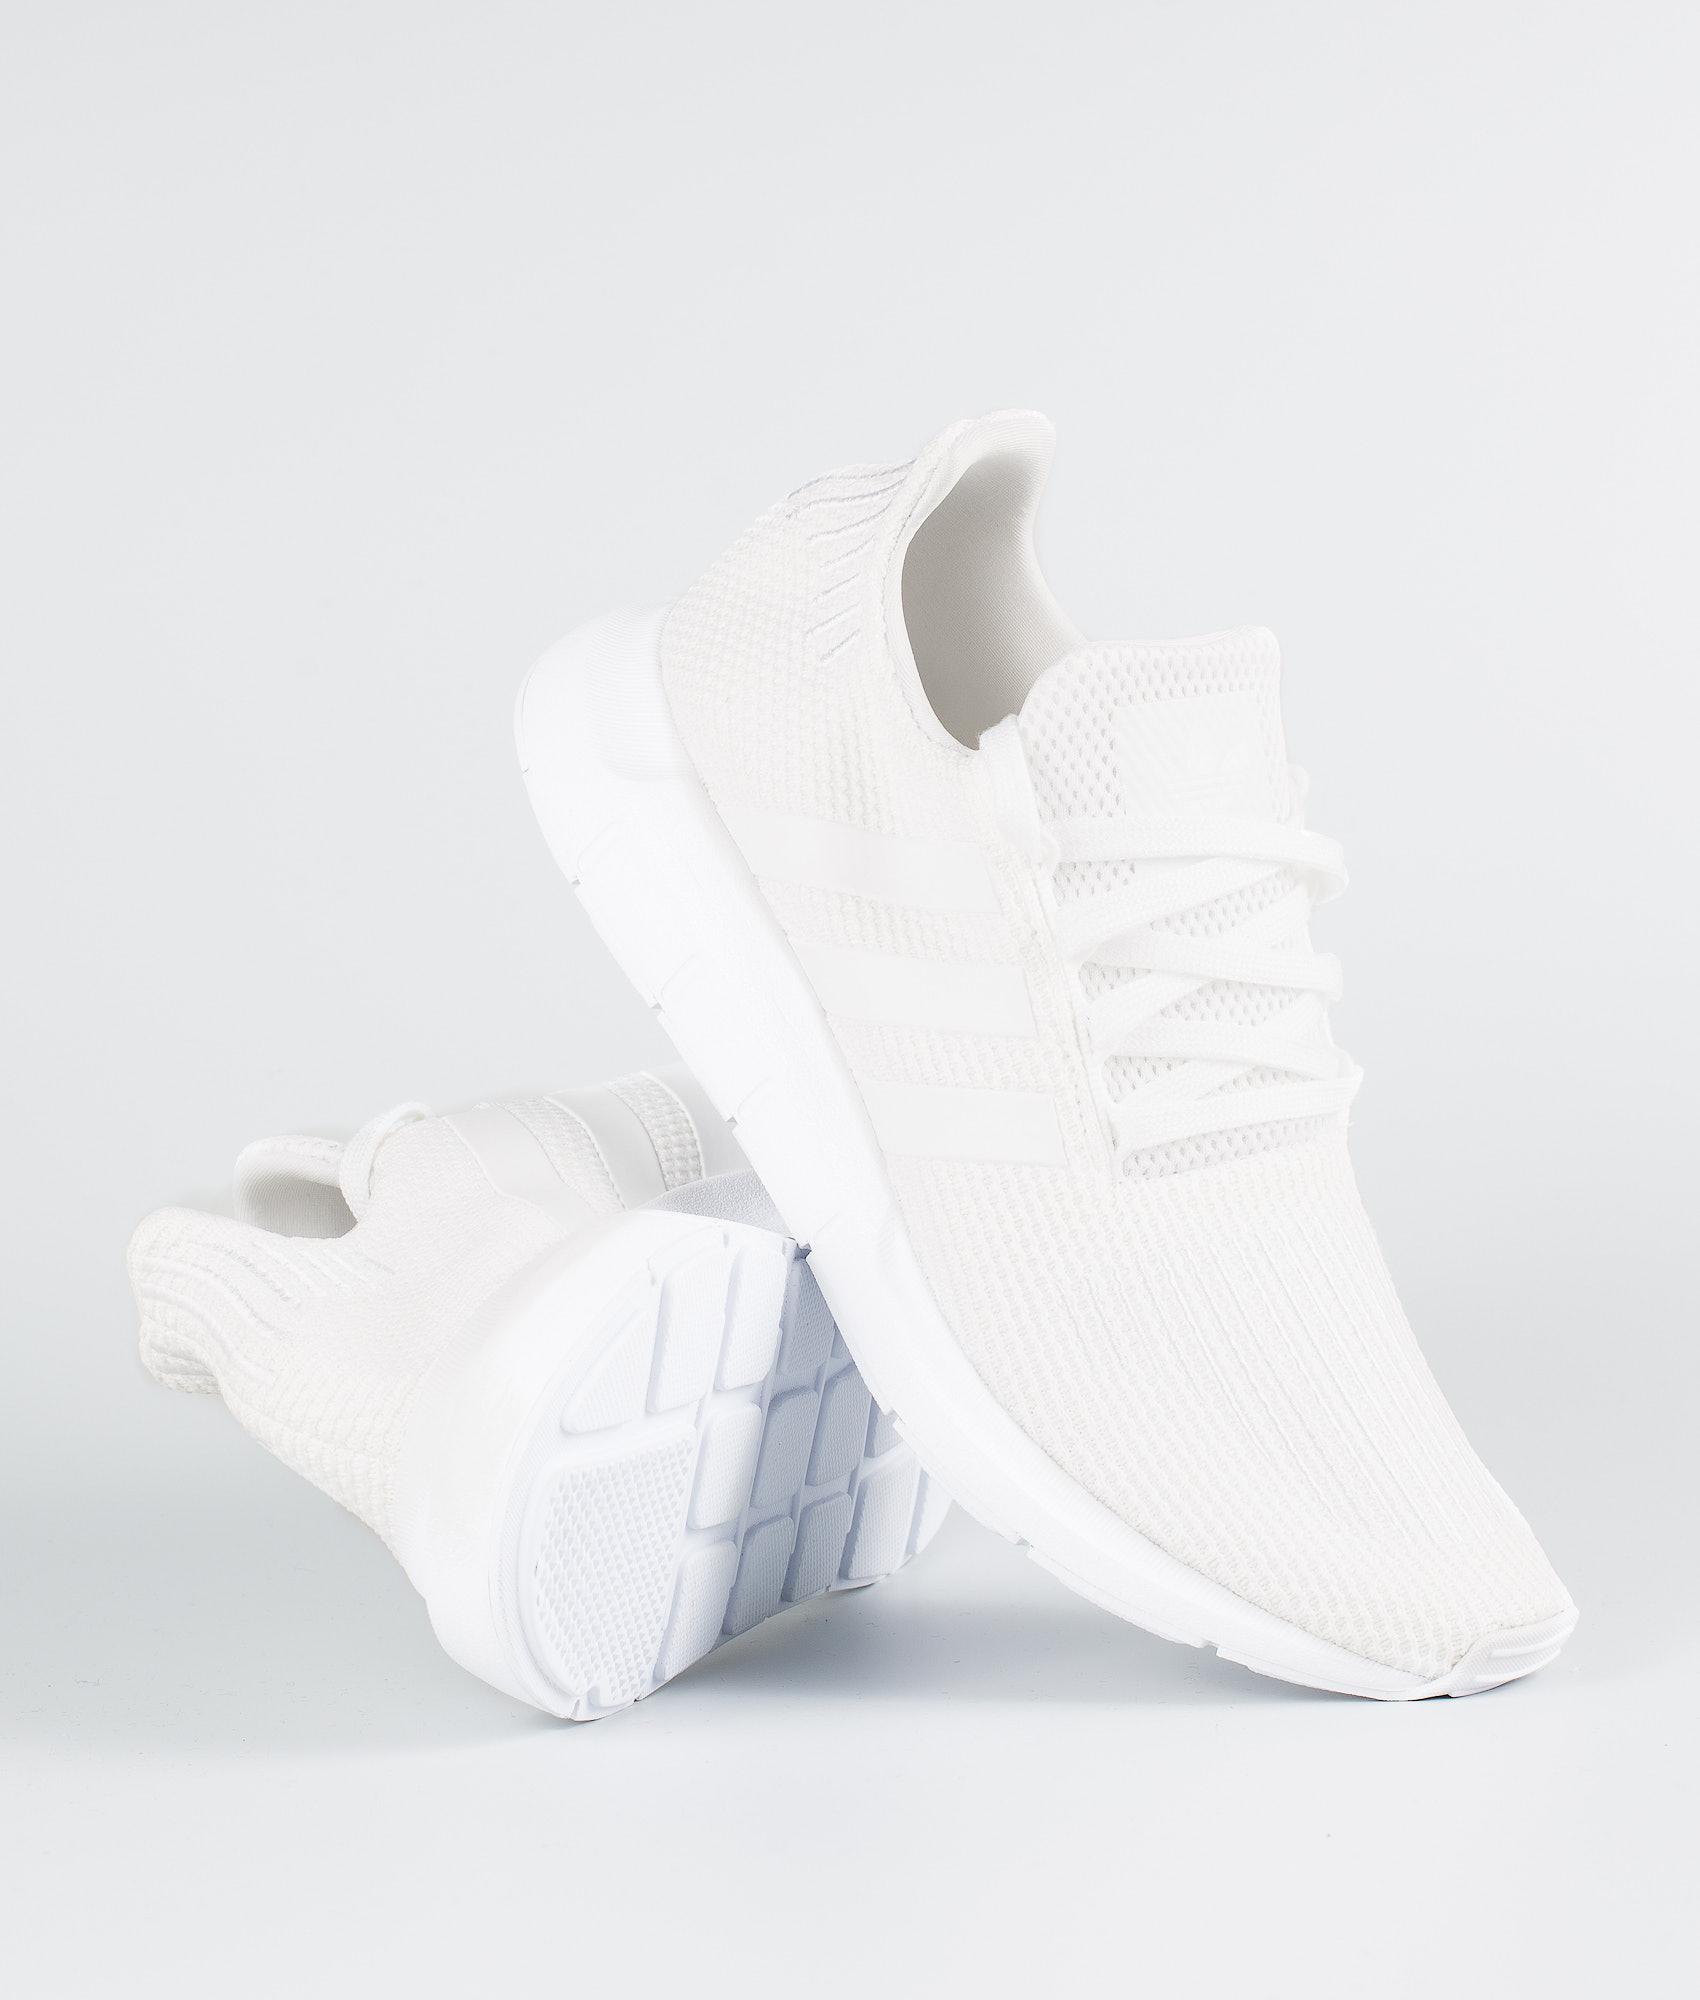 b424b509c Adidas Originals